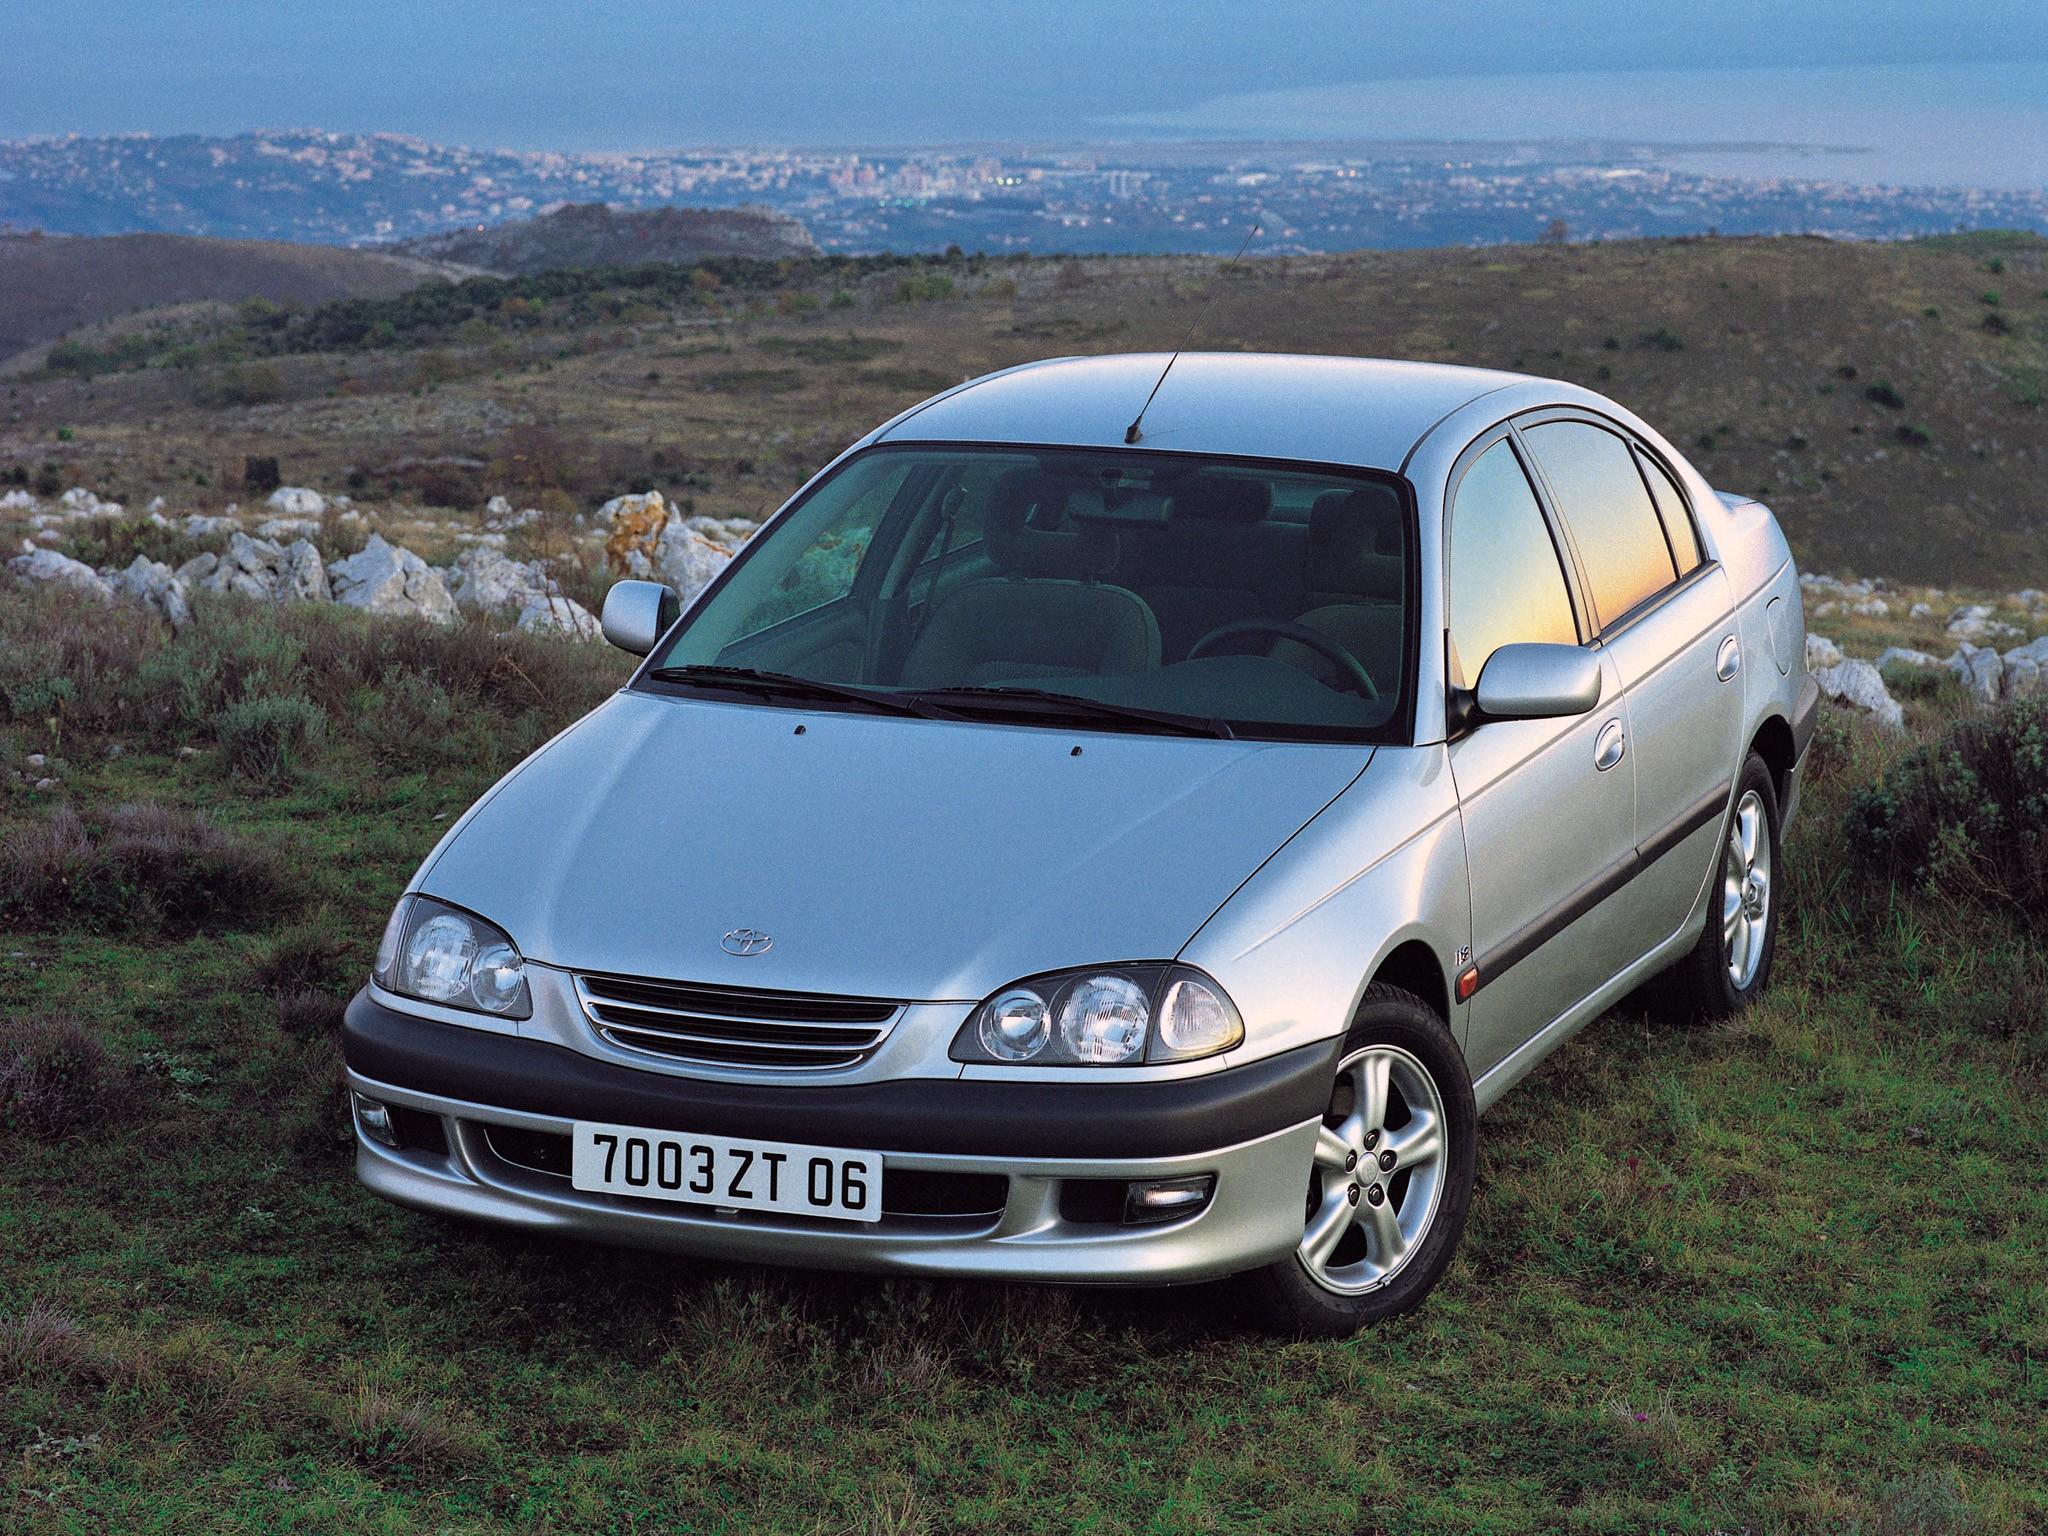 Toyota Avensis I 1997 - 2000 Hatchback 5 door #1